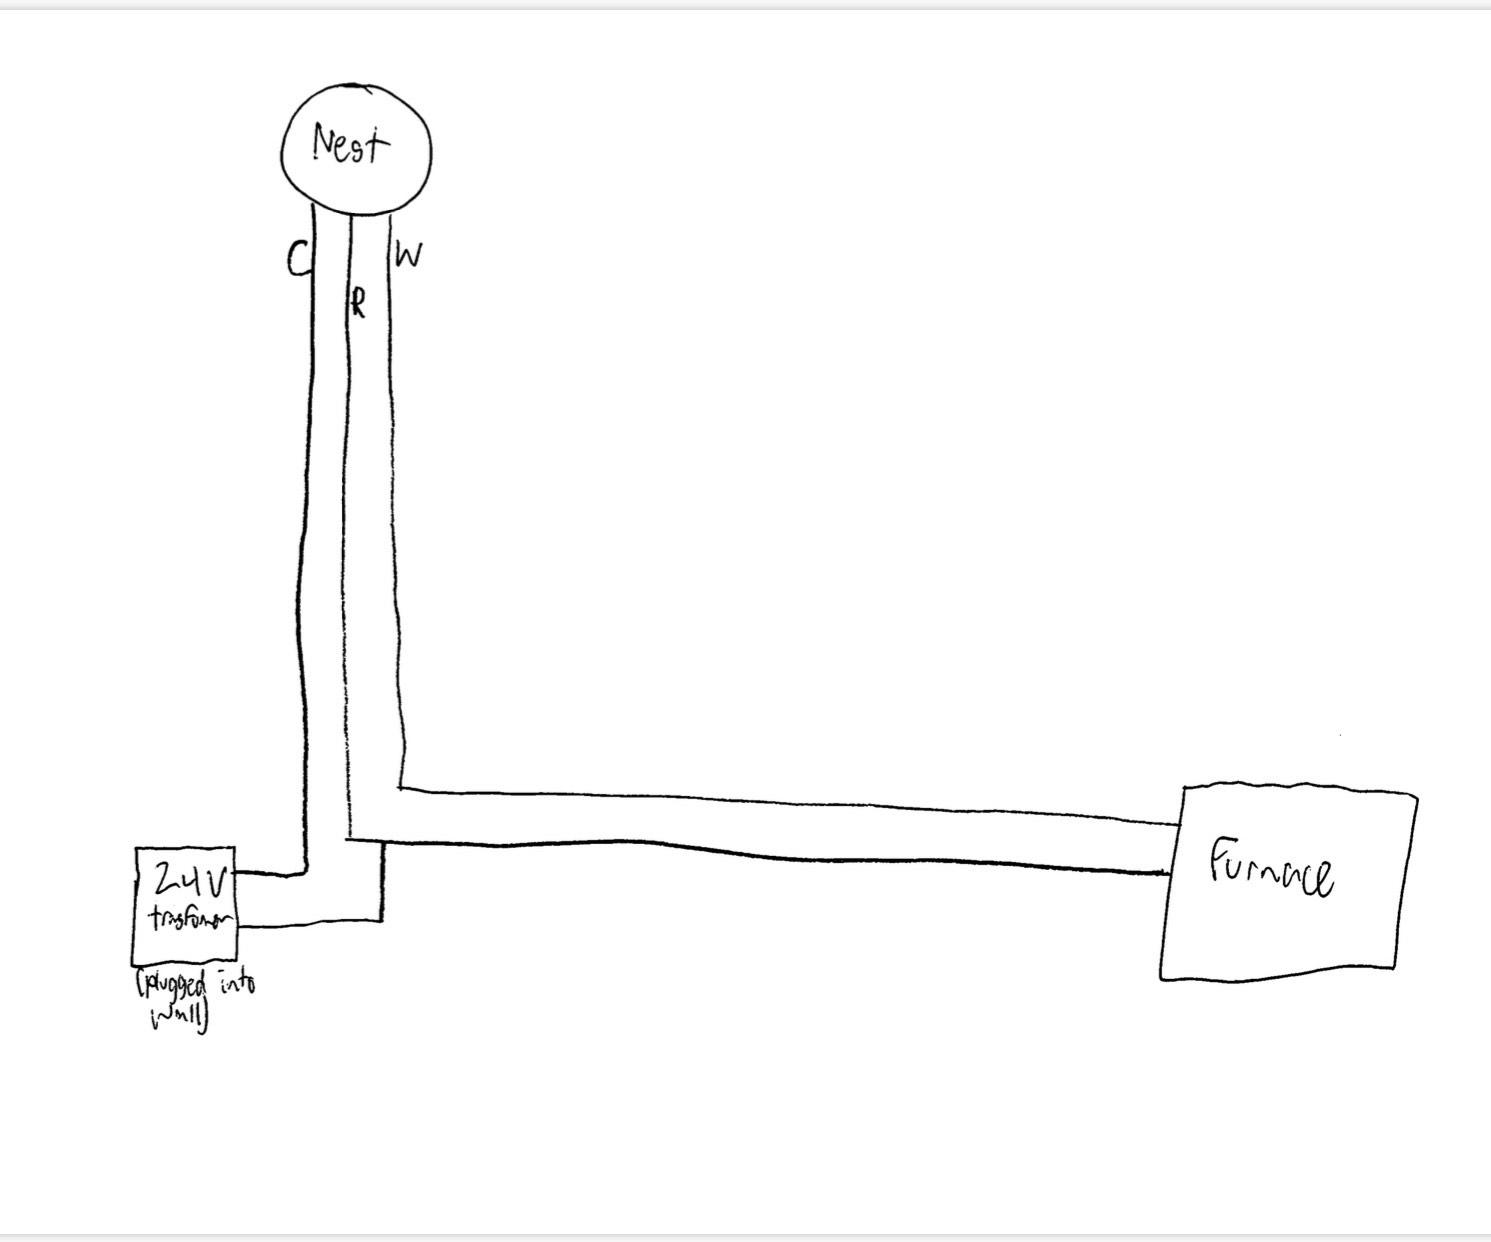 Nest Wiring Diagram 2 Wire / Nest Thermostat 2 Wire Hookup